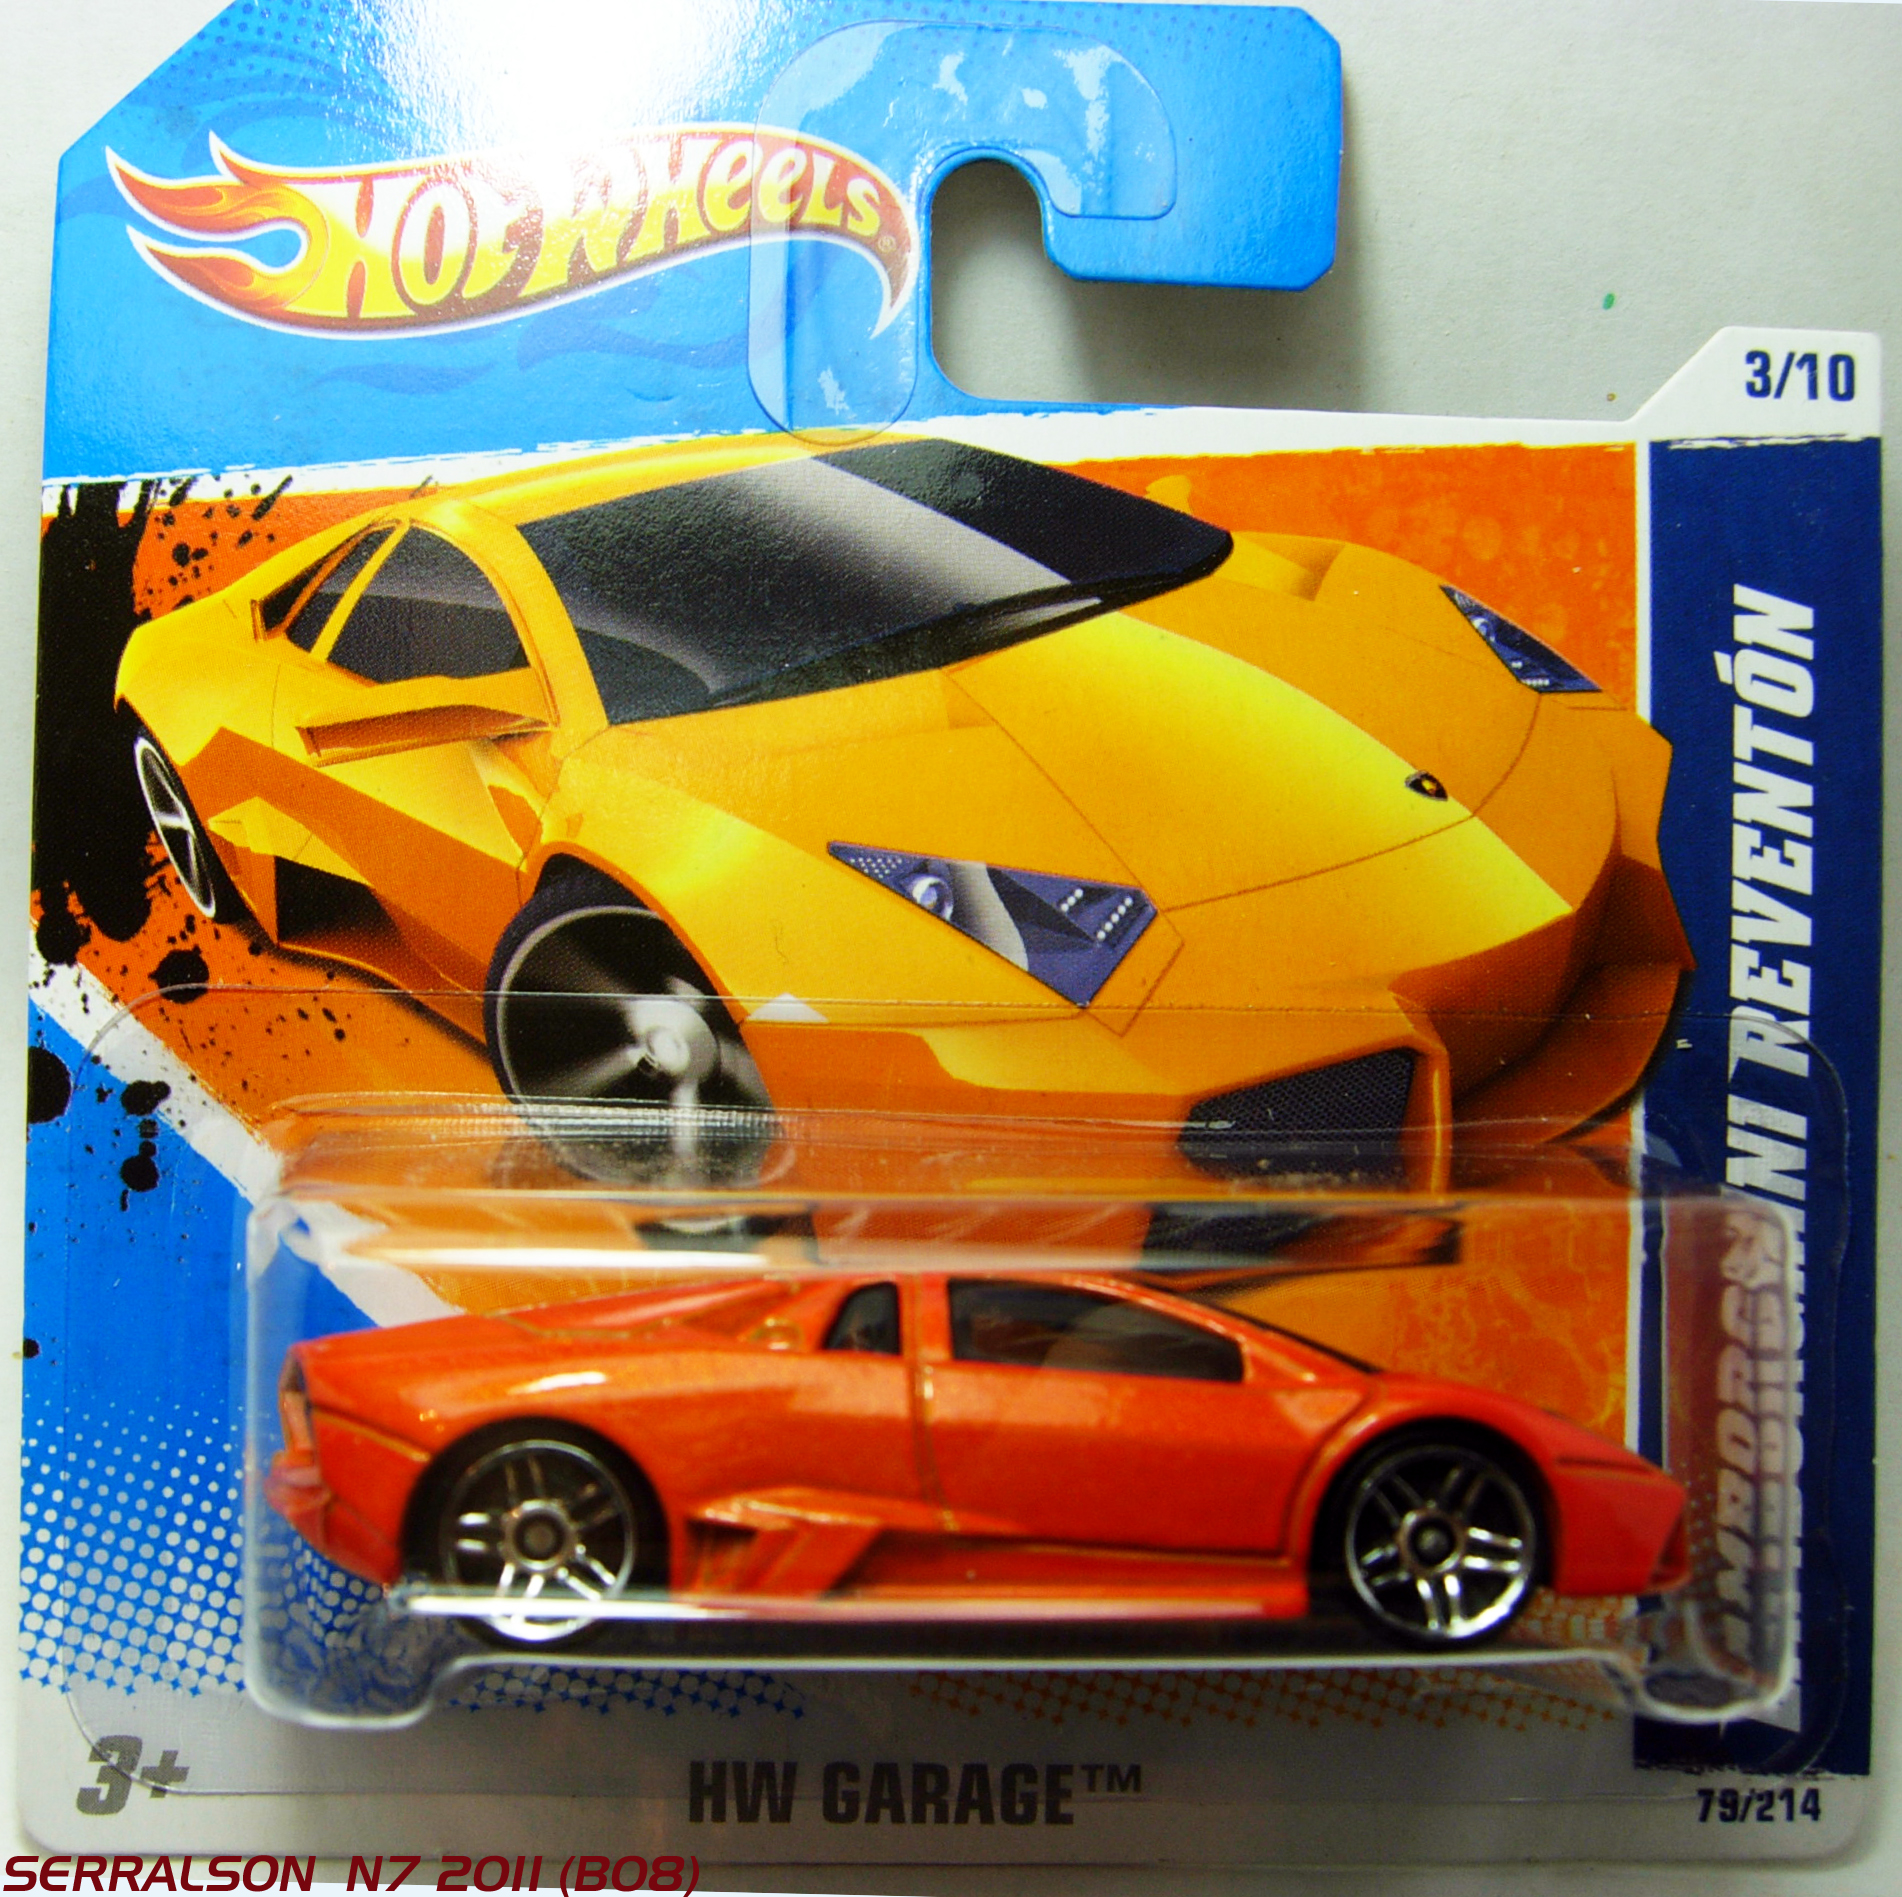 latest?cb=20110225213732 Surprising Lamborghini Gallardo Hot Wheels Wiki Cars Trend